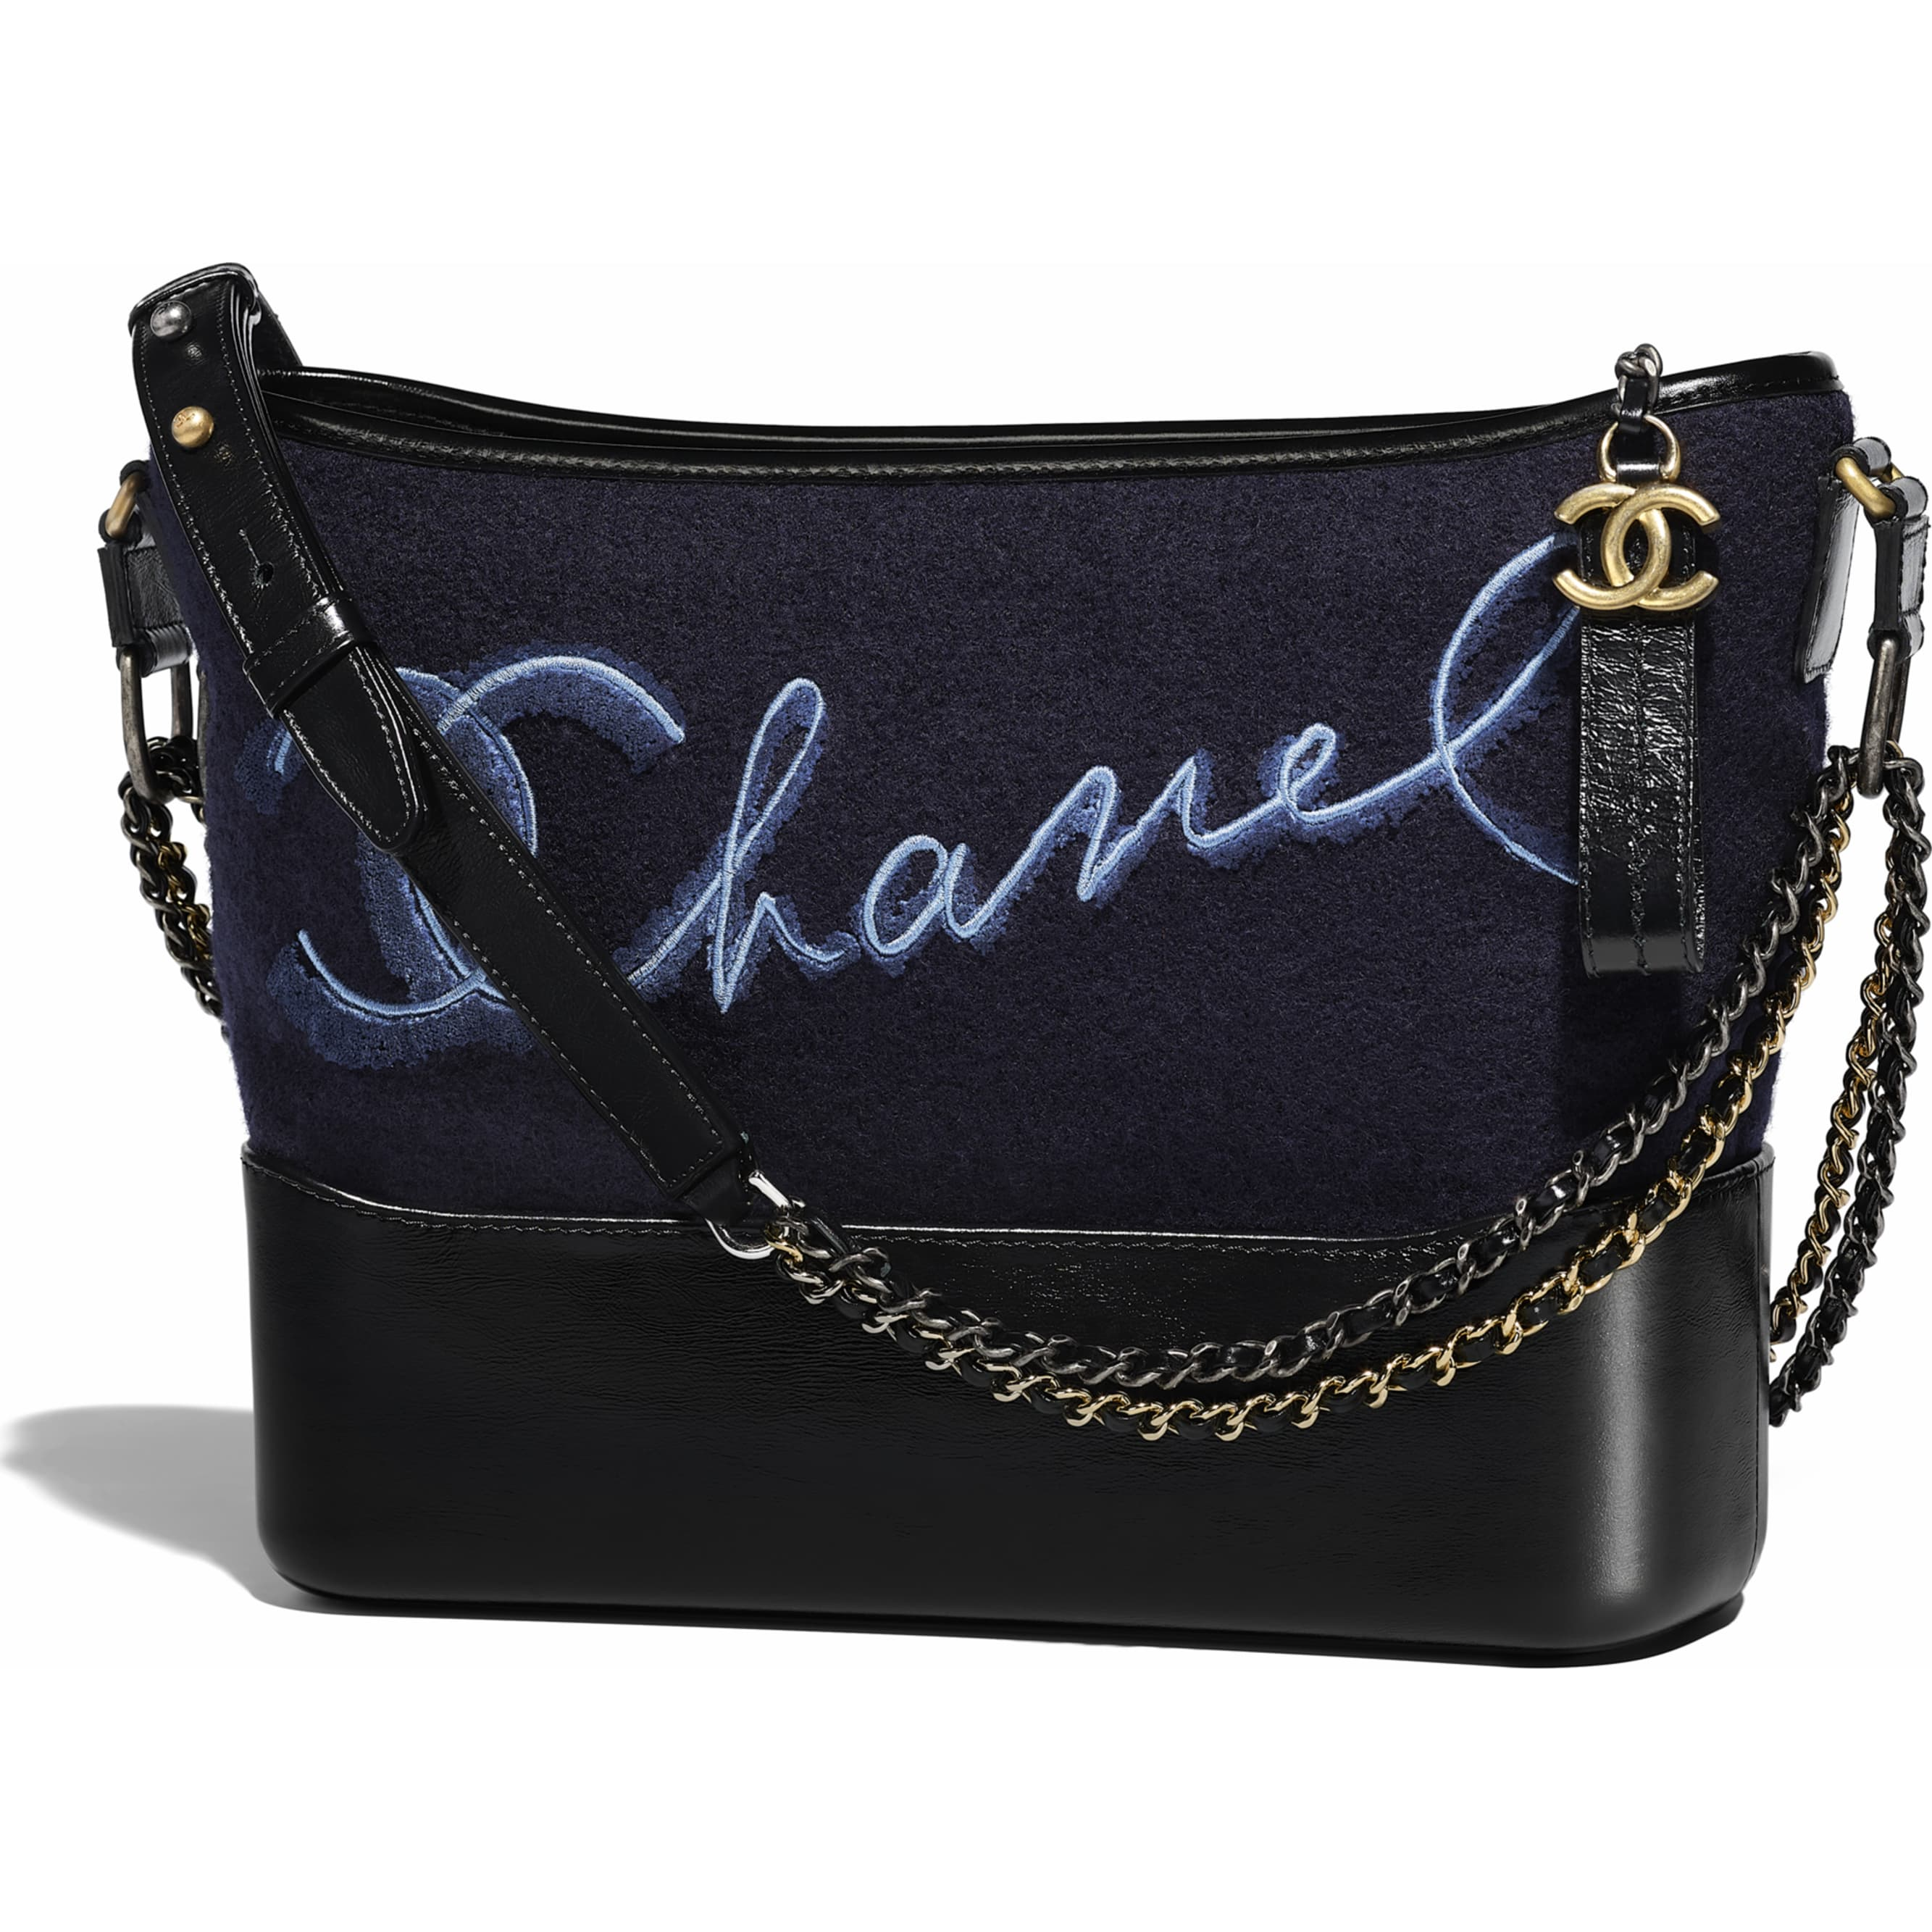 1aaf5e2916 chanel-s-gabrielle-hobo-bag-navy-blue-blue-embroidered-wool-calfskin ...